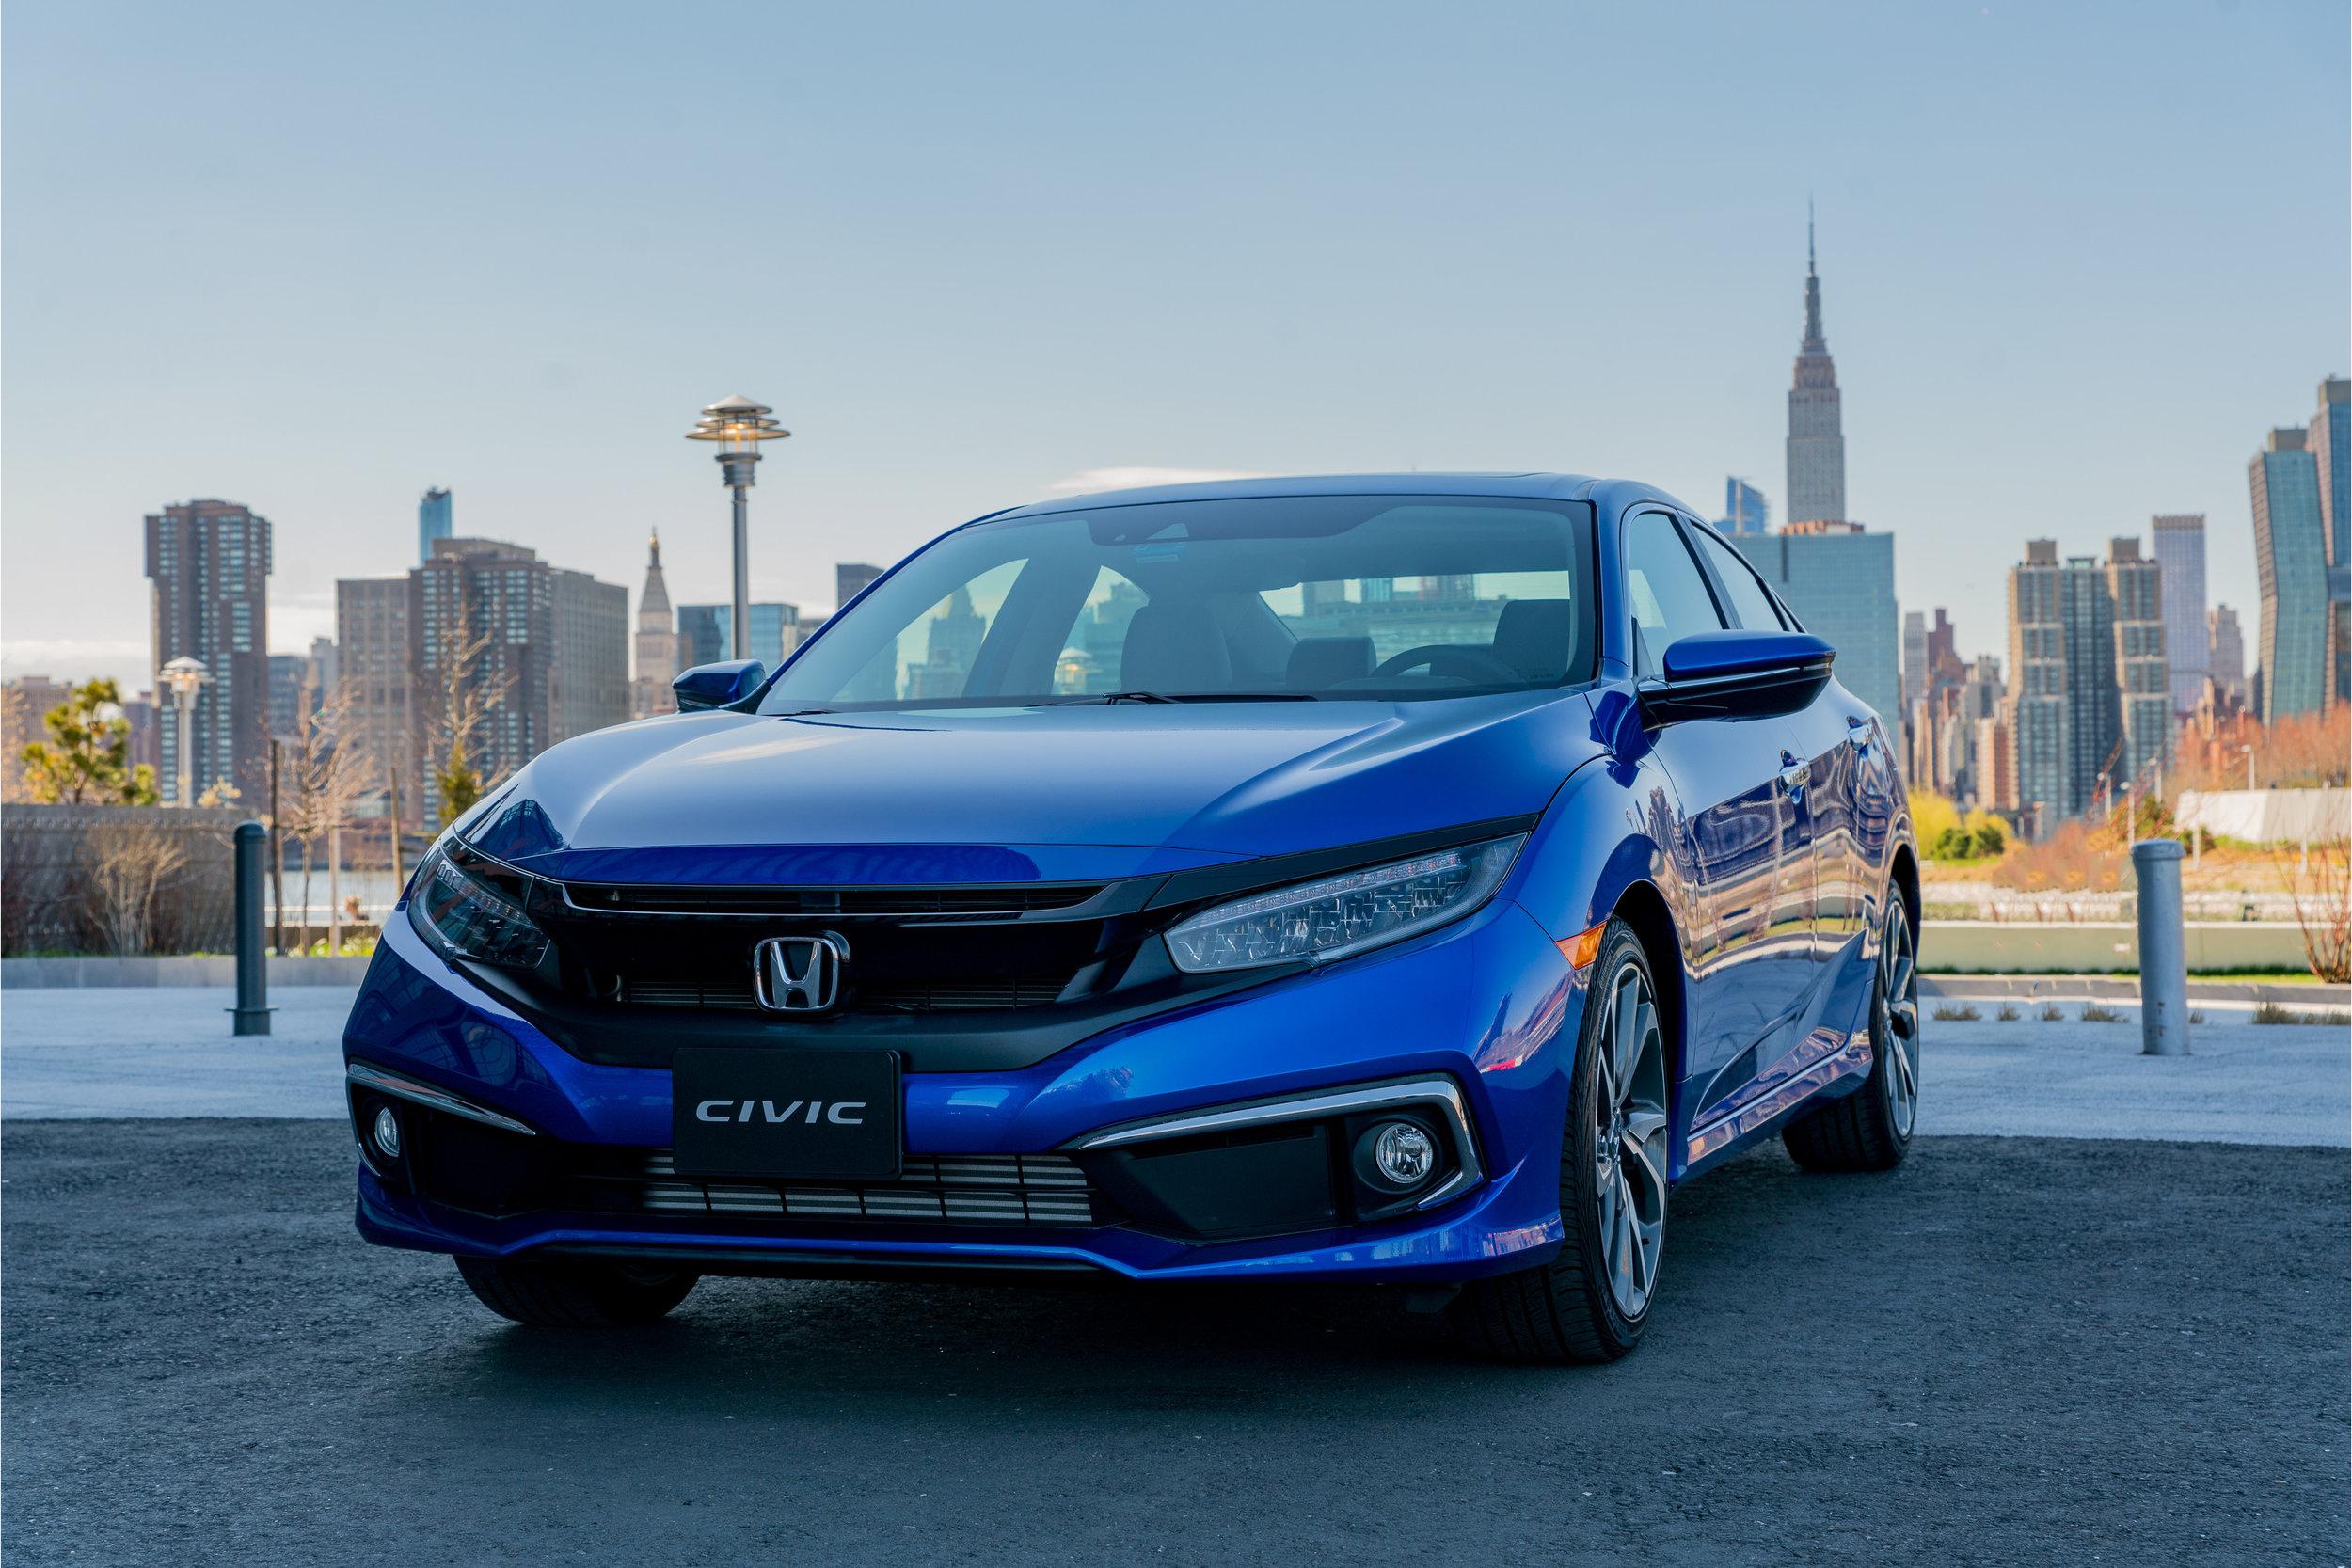 Honda Civic Commercial >> Commercial Illkoncept